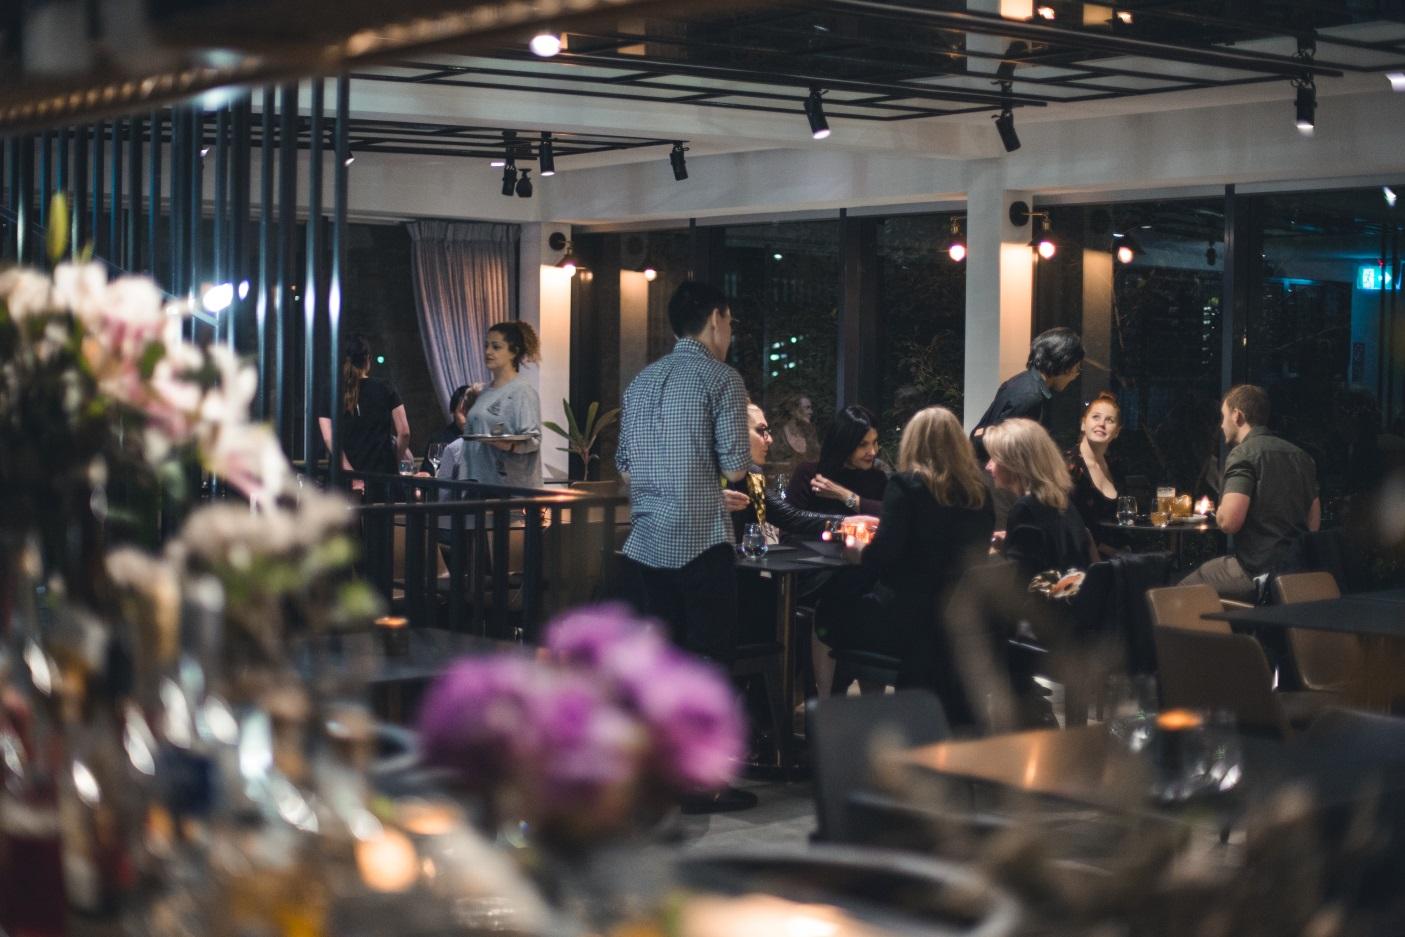 KOI_Dessert_Bar_Dining_Interior.jpg